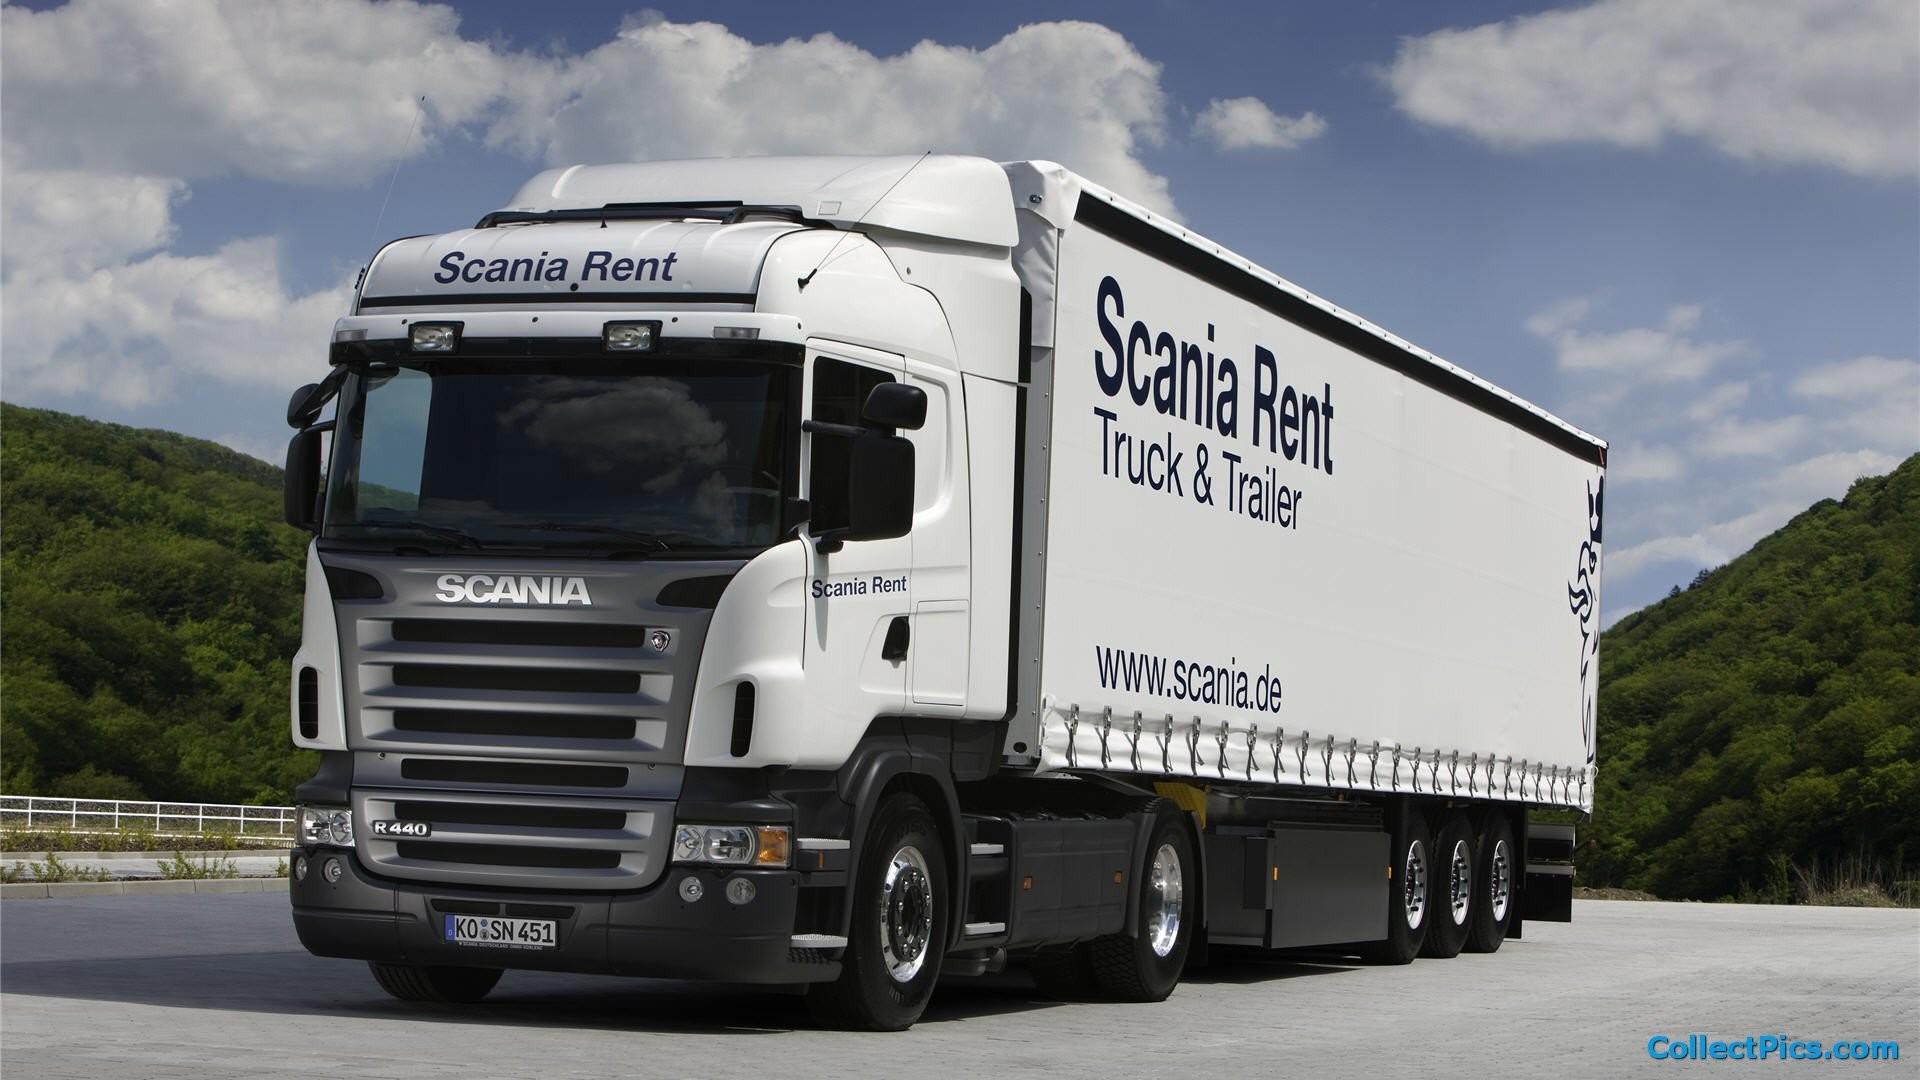 1920x1080 Scania Truck 527422